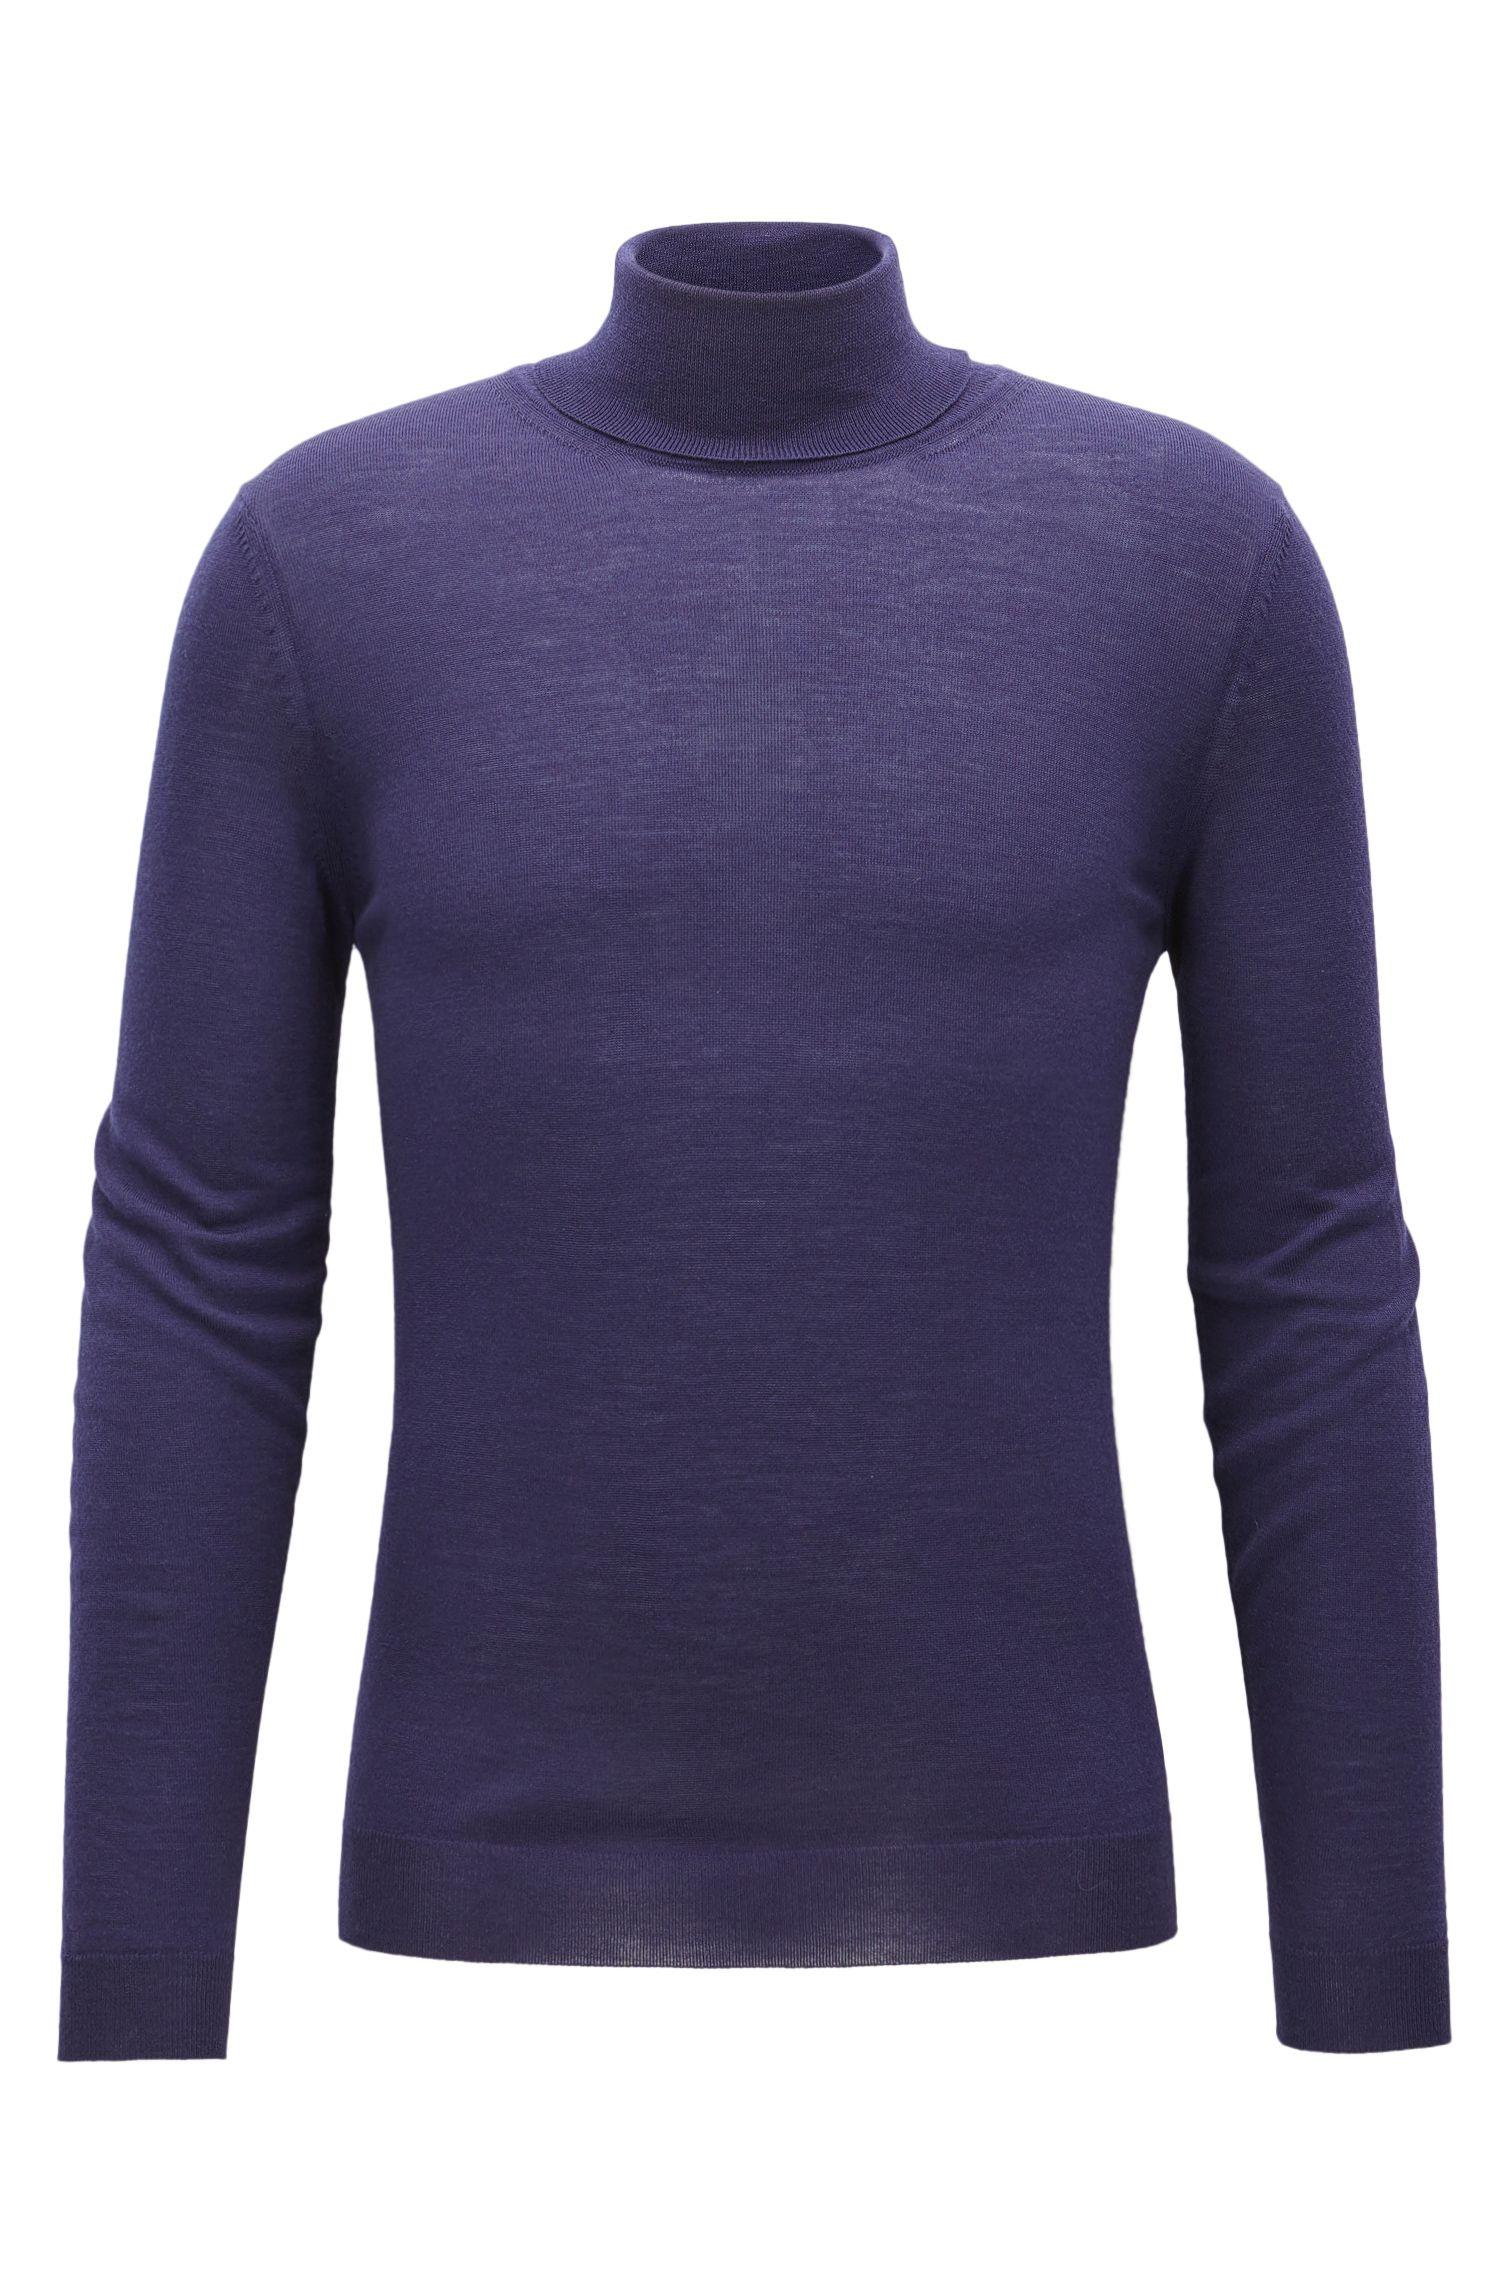 Slim-fit turtle-neck sweater in wool